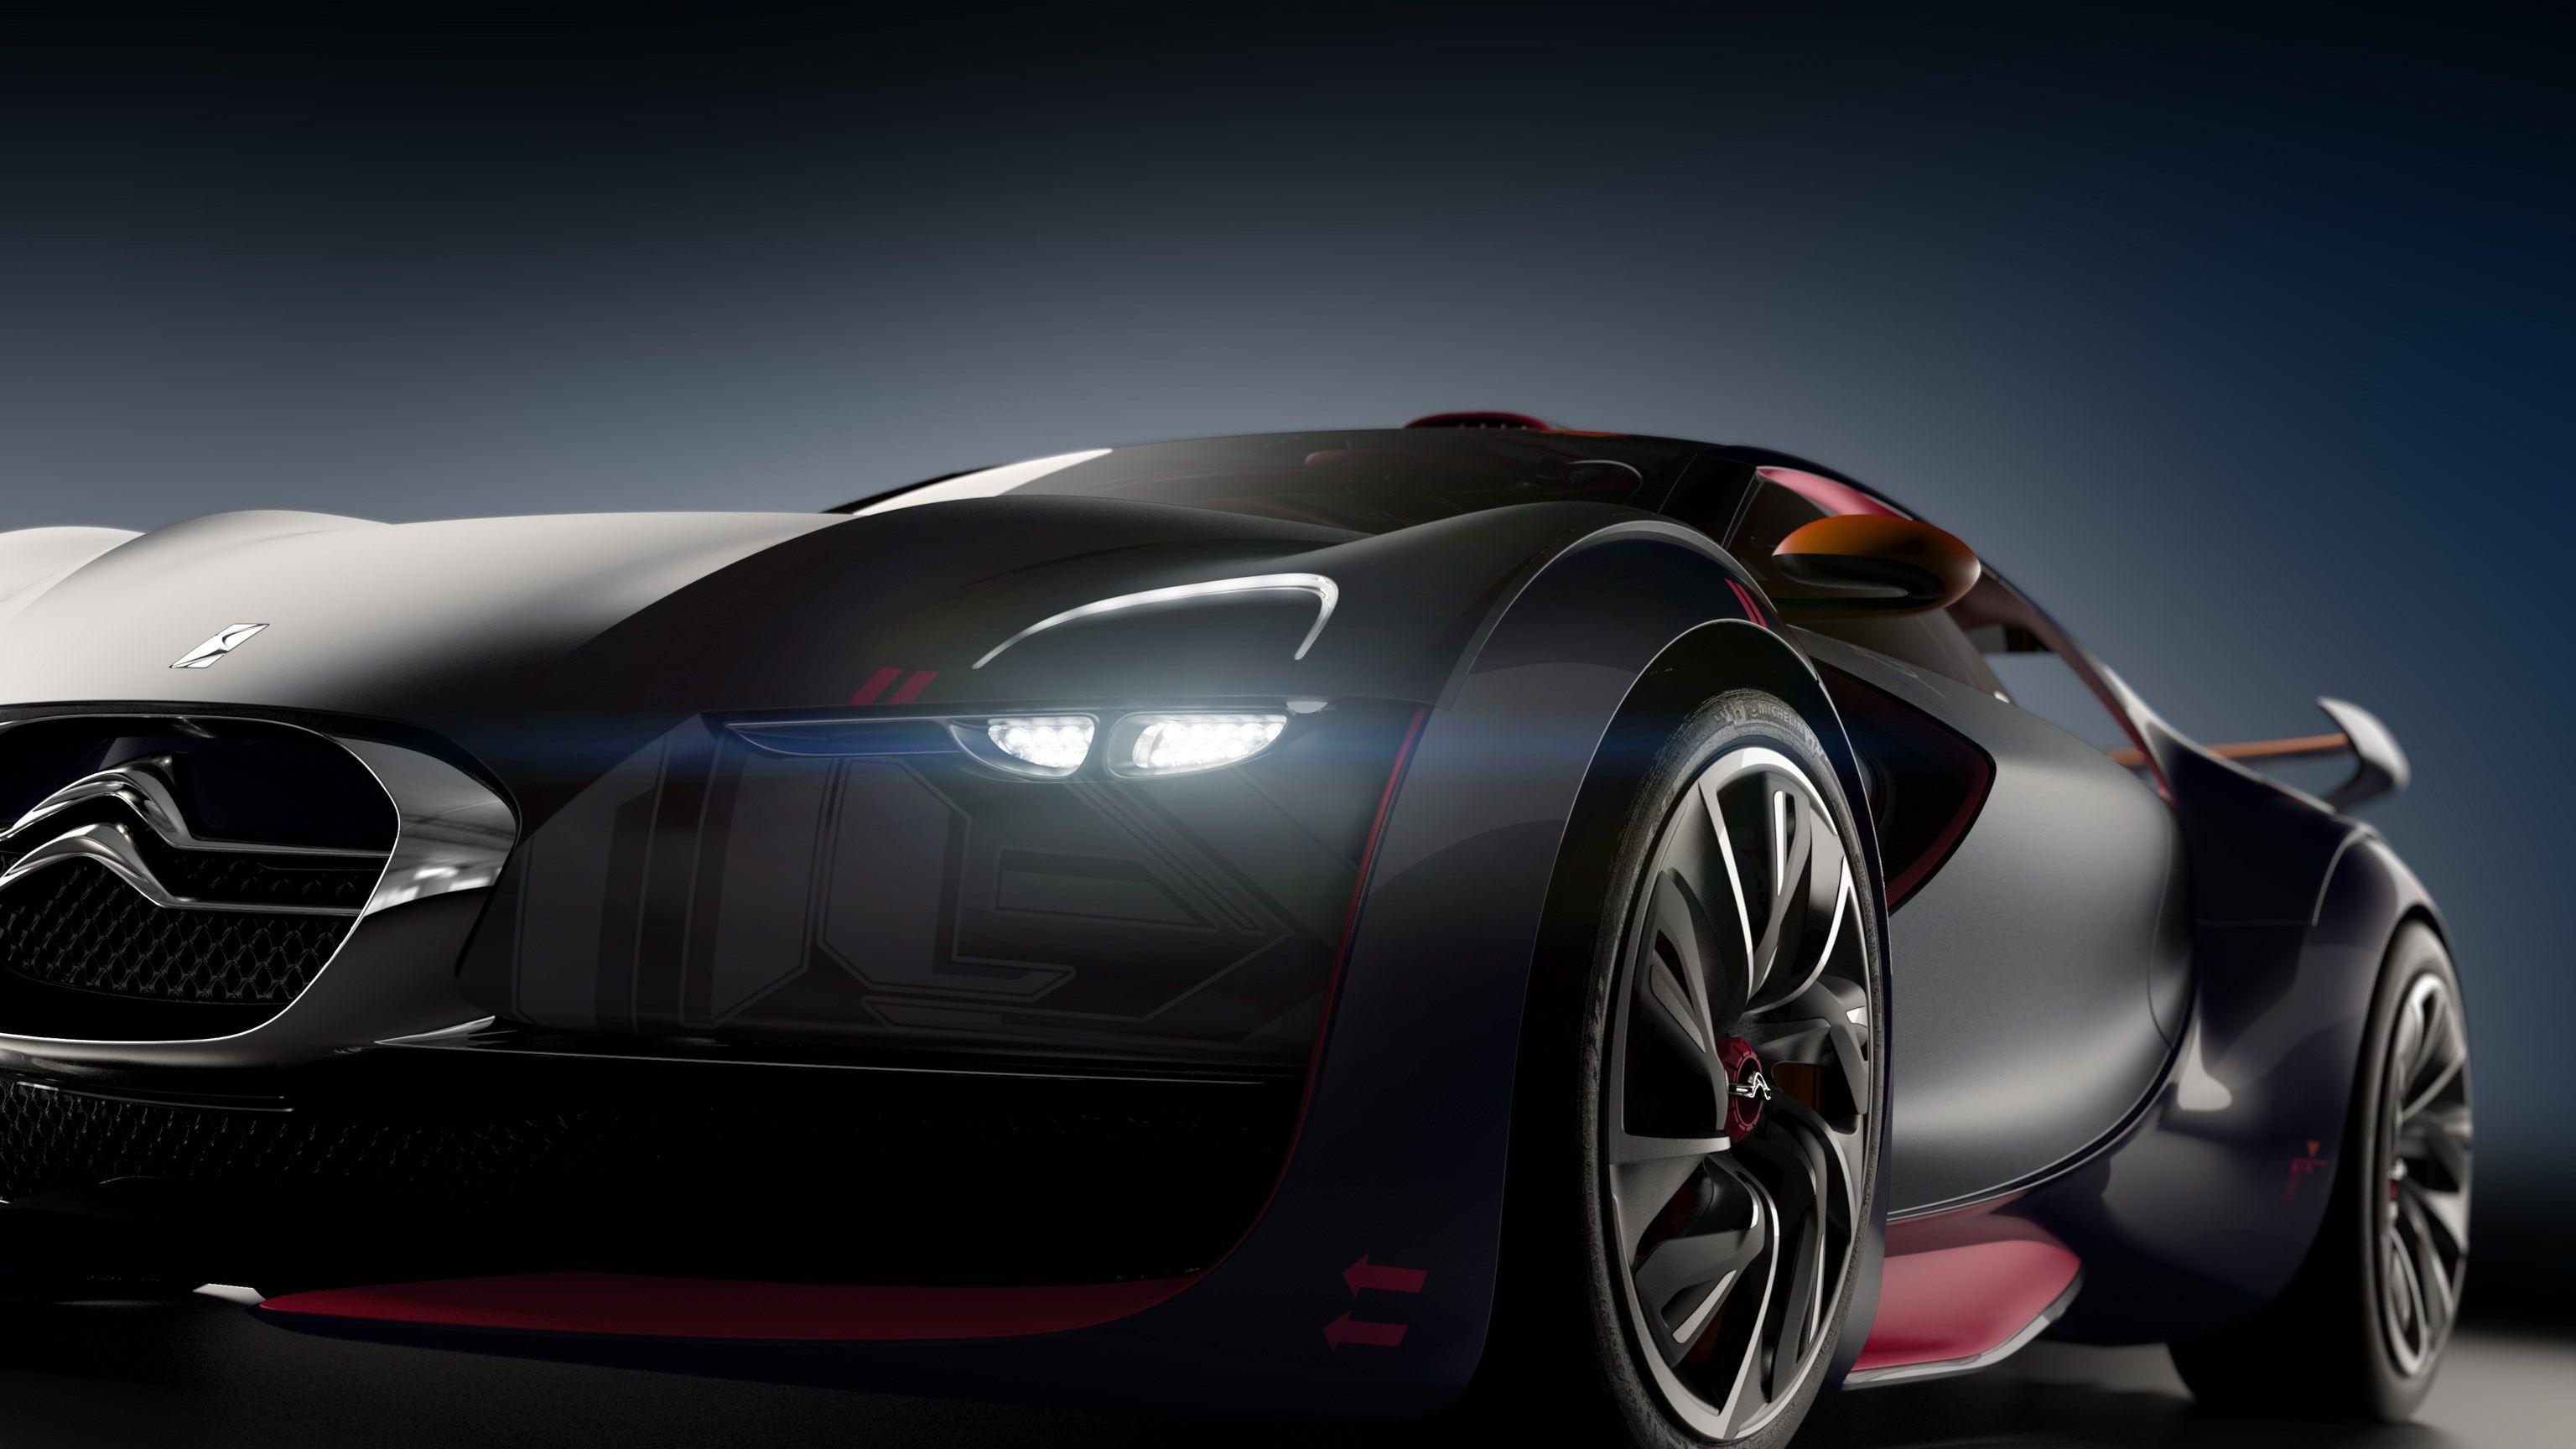 035d21a975b09539be28e4a34983b0c1 Marvelous Lamborghini Huracan Hack asphalt 8 Cars Trend